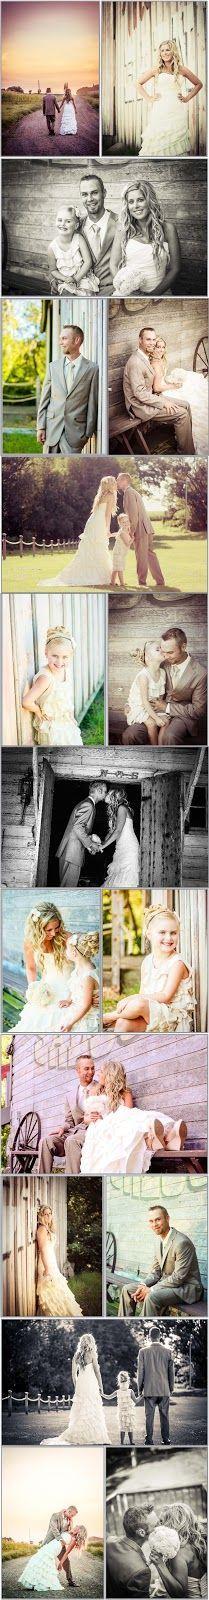 Summer Country/Barn Wedding - No Bridal Party - Small Family Wedding ...